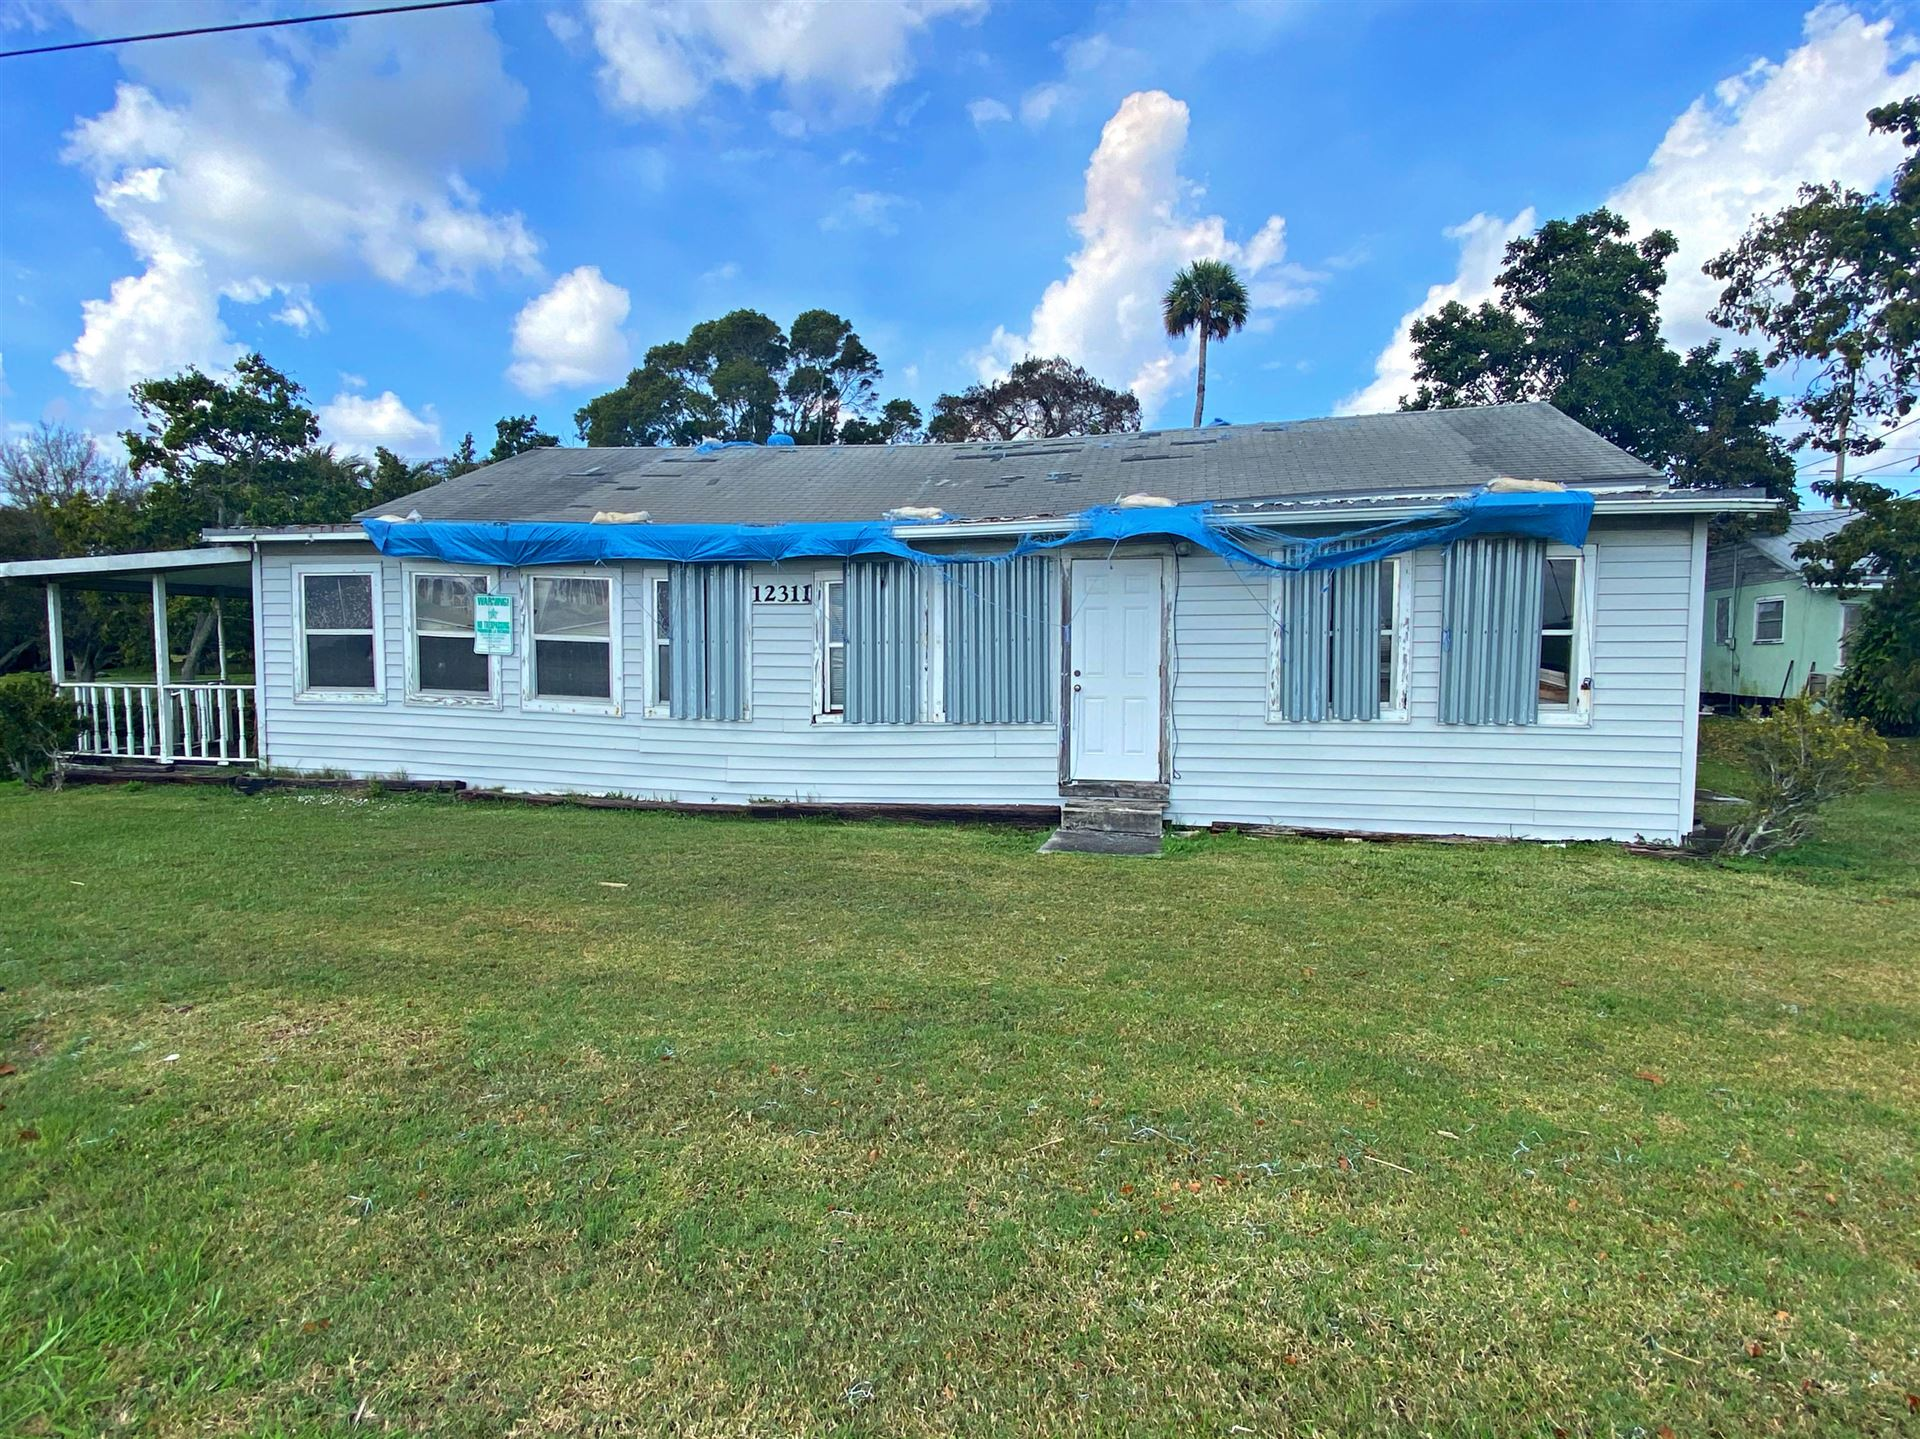 12311 Everglades Street, Canal Point, FL 33438 - MLS#: RX-10743569